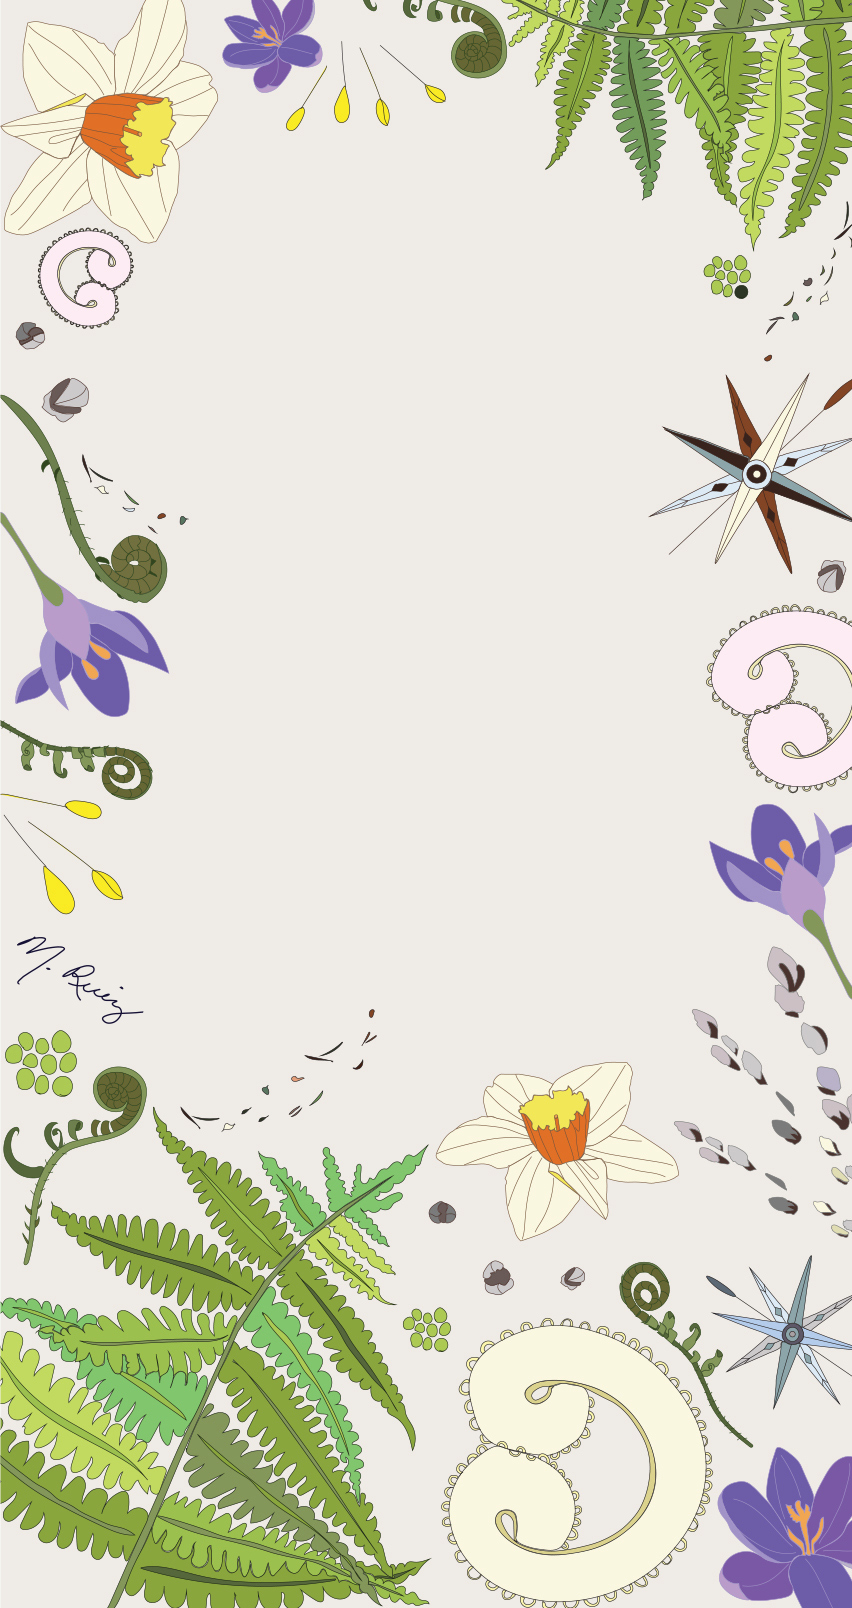 Spring Wind mobile phone wallpaper - Light